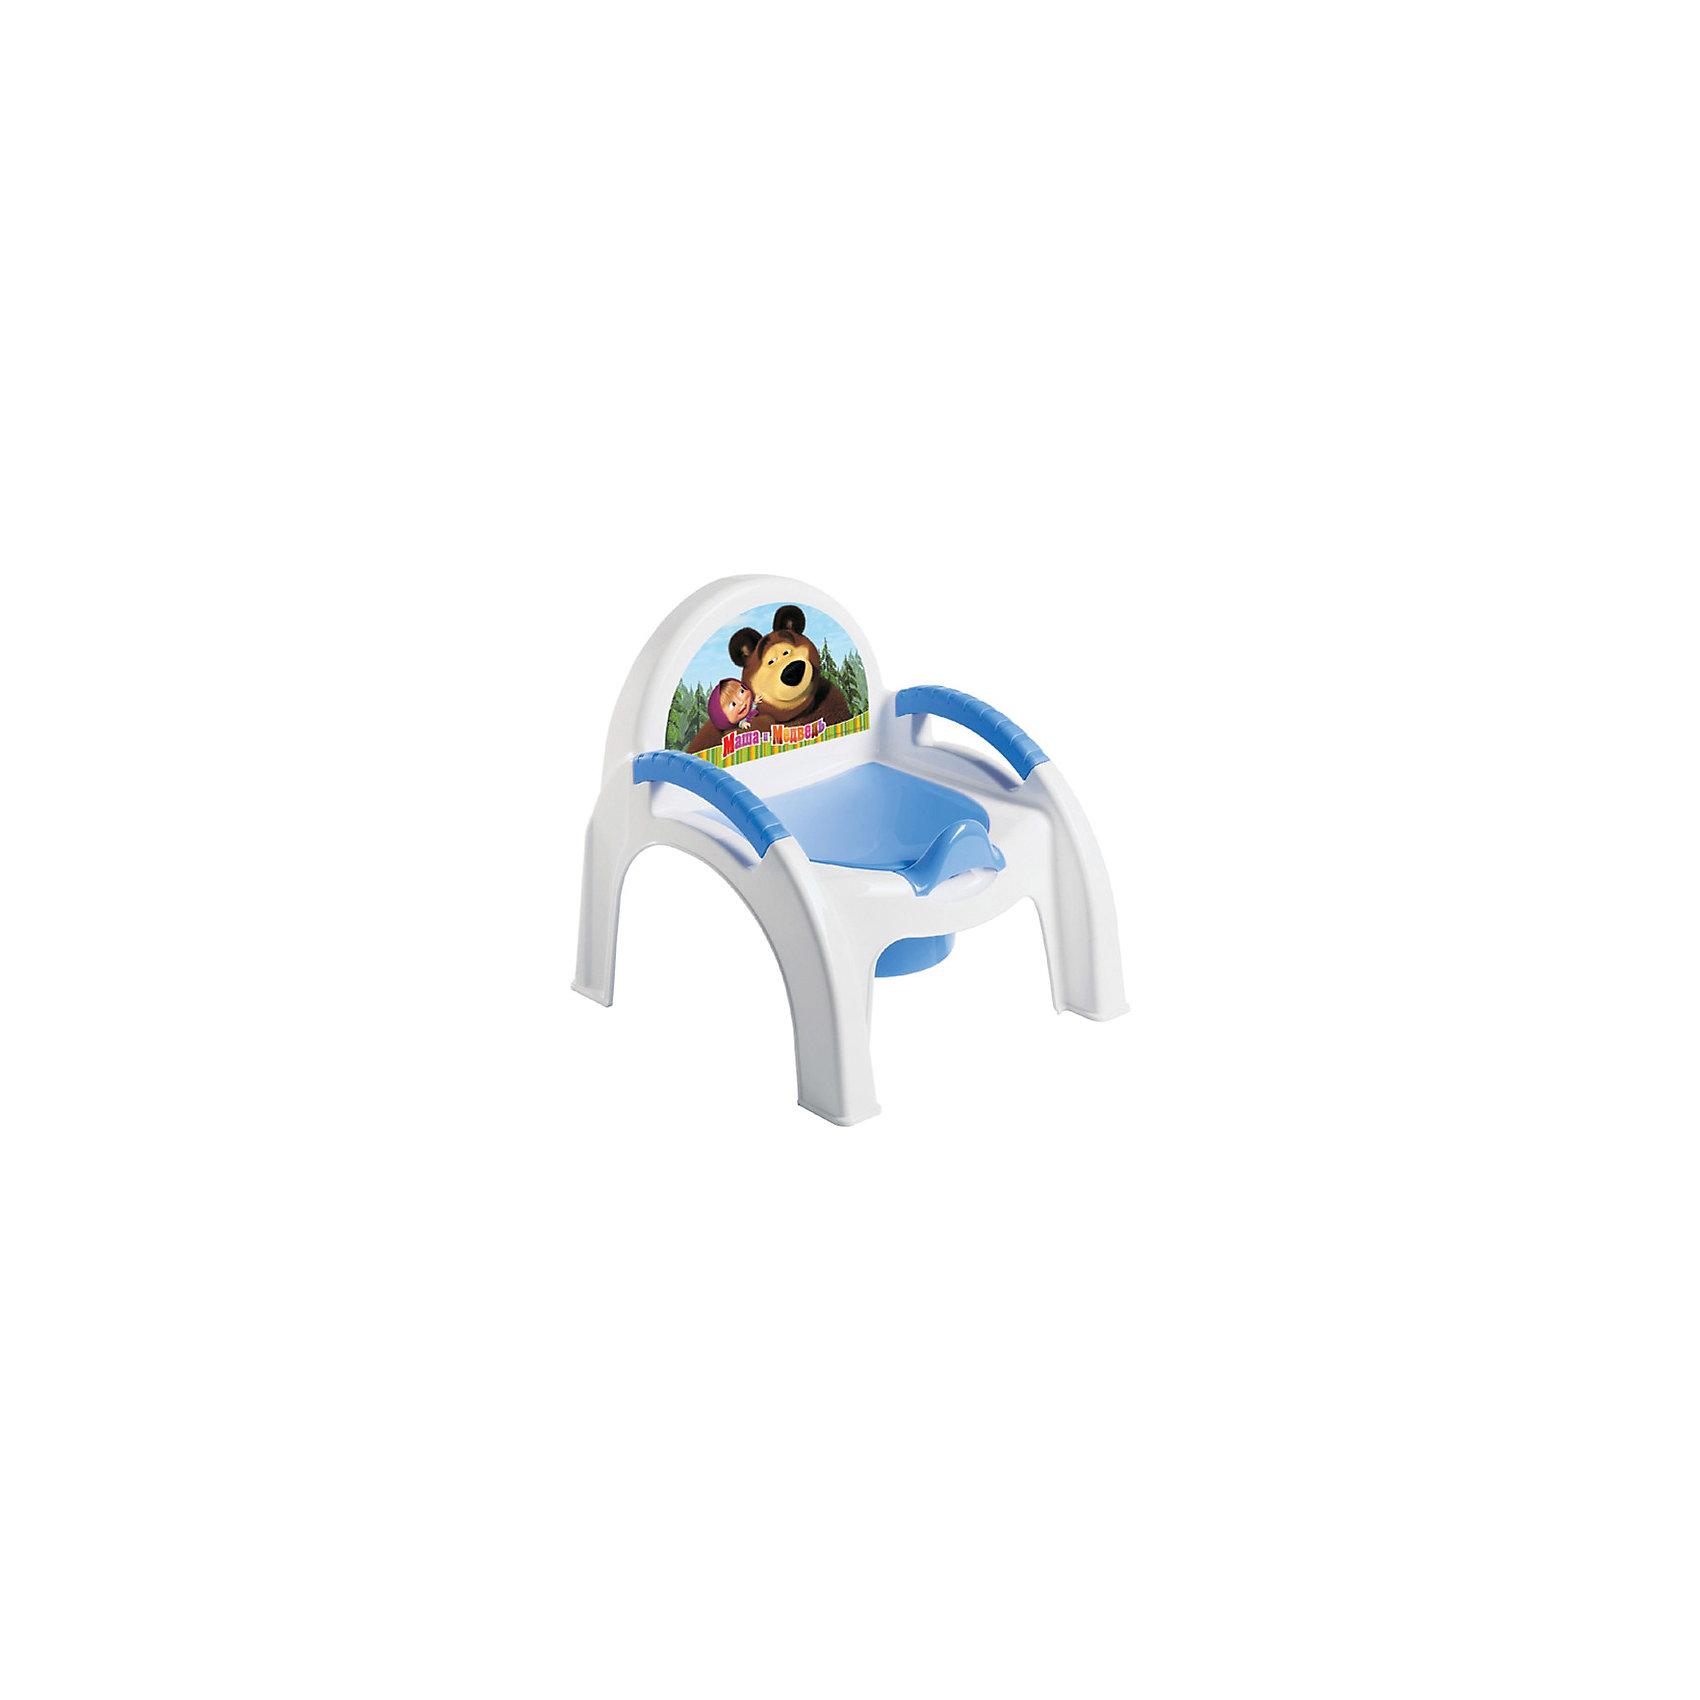 Пластишка Горшок-стульчик Маша и Медведь, Пластишка, пластишка горка для купания детей пластишка